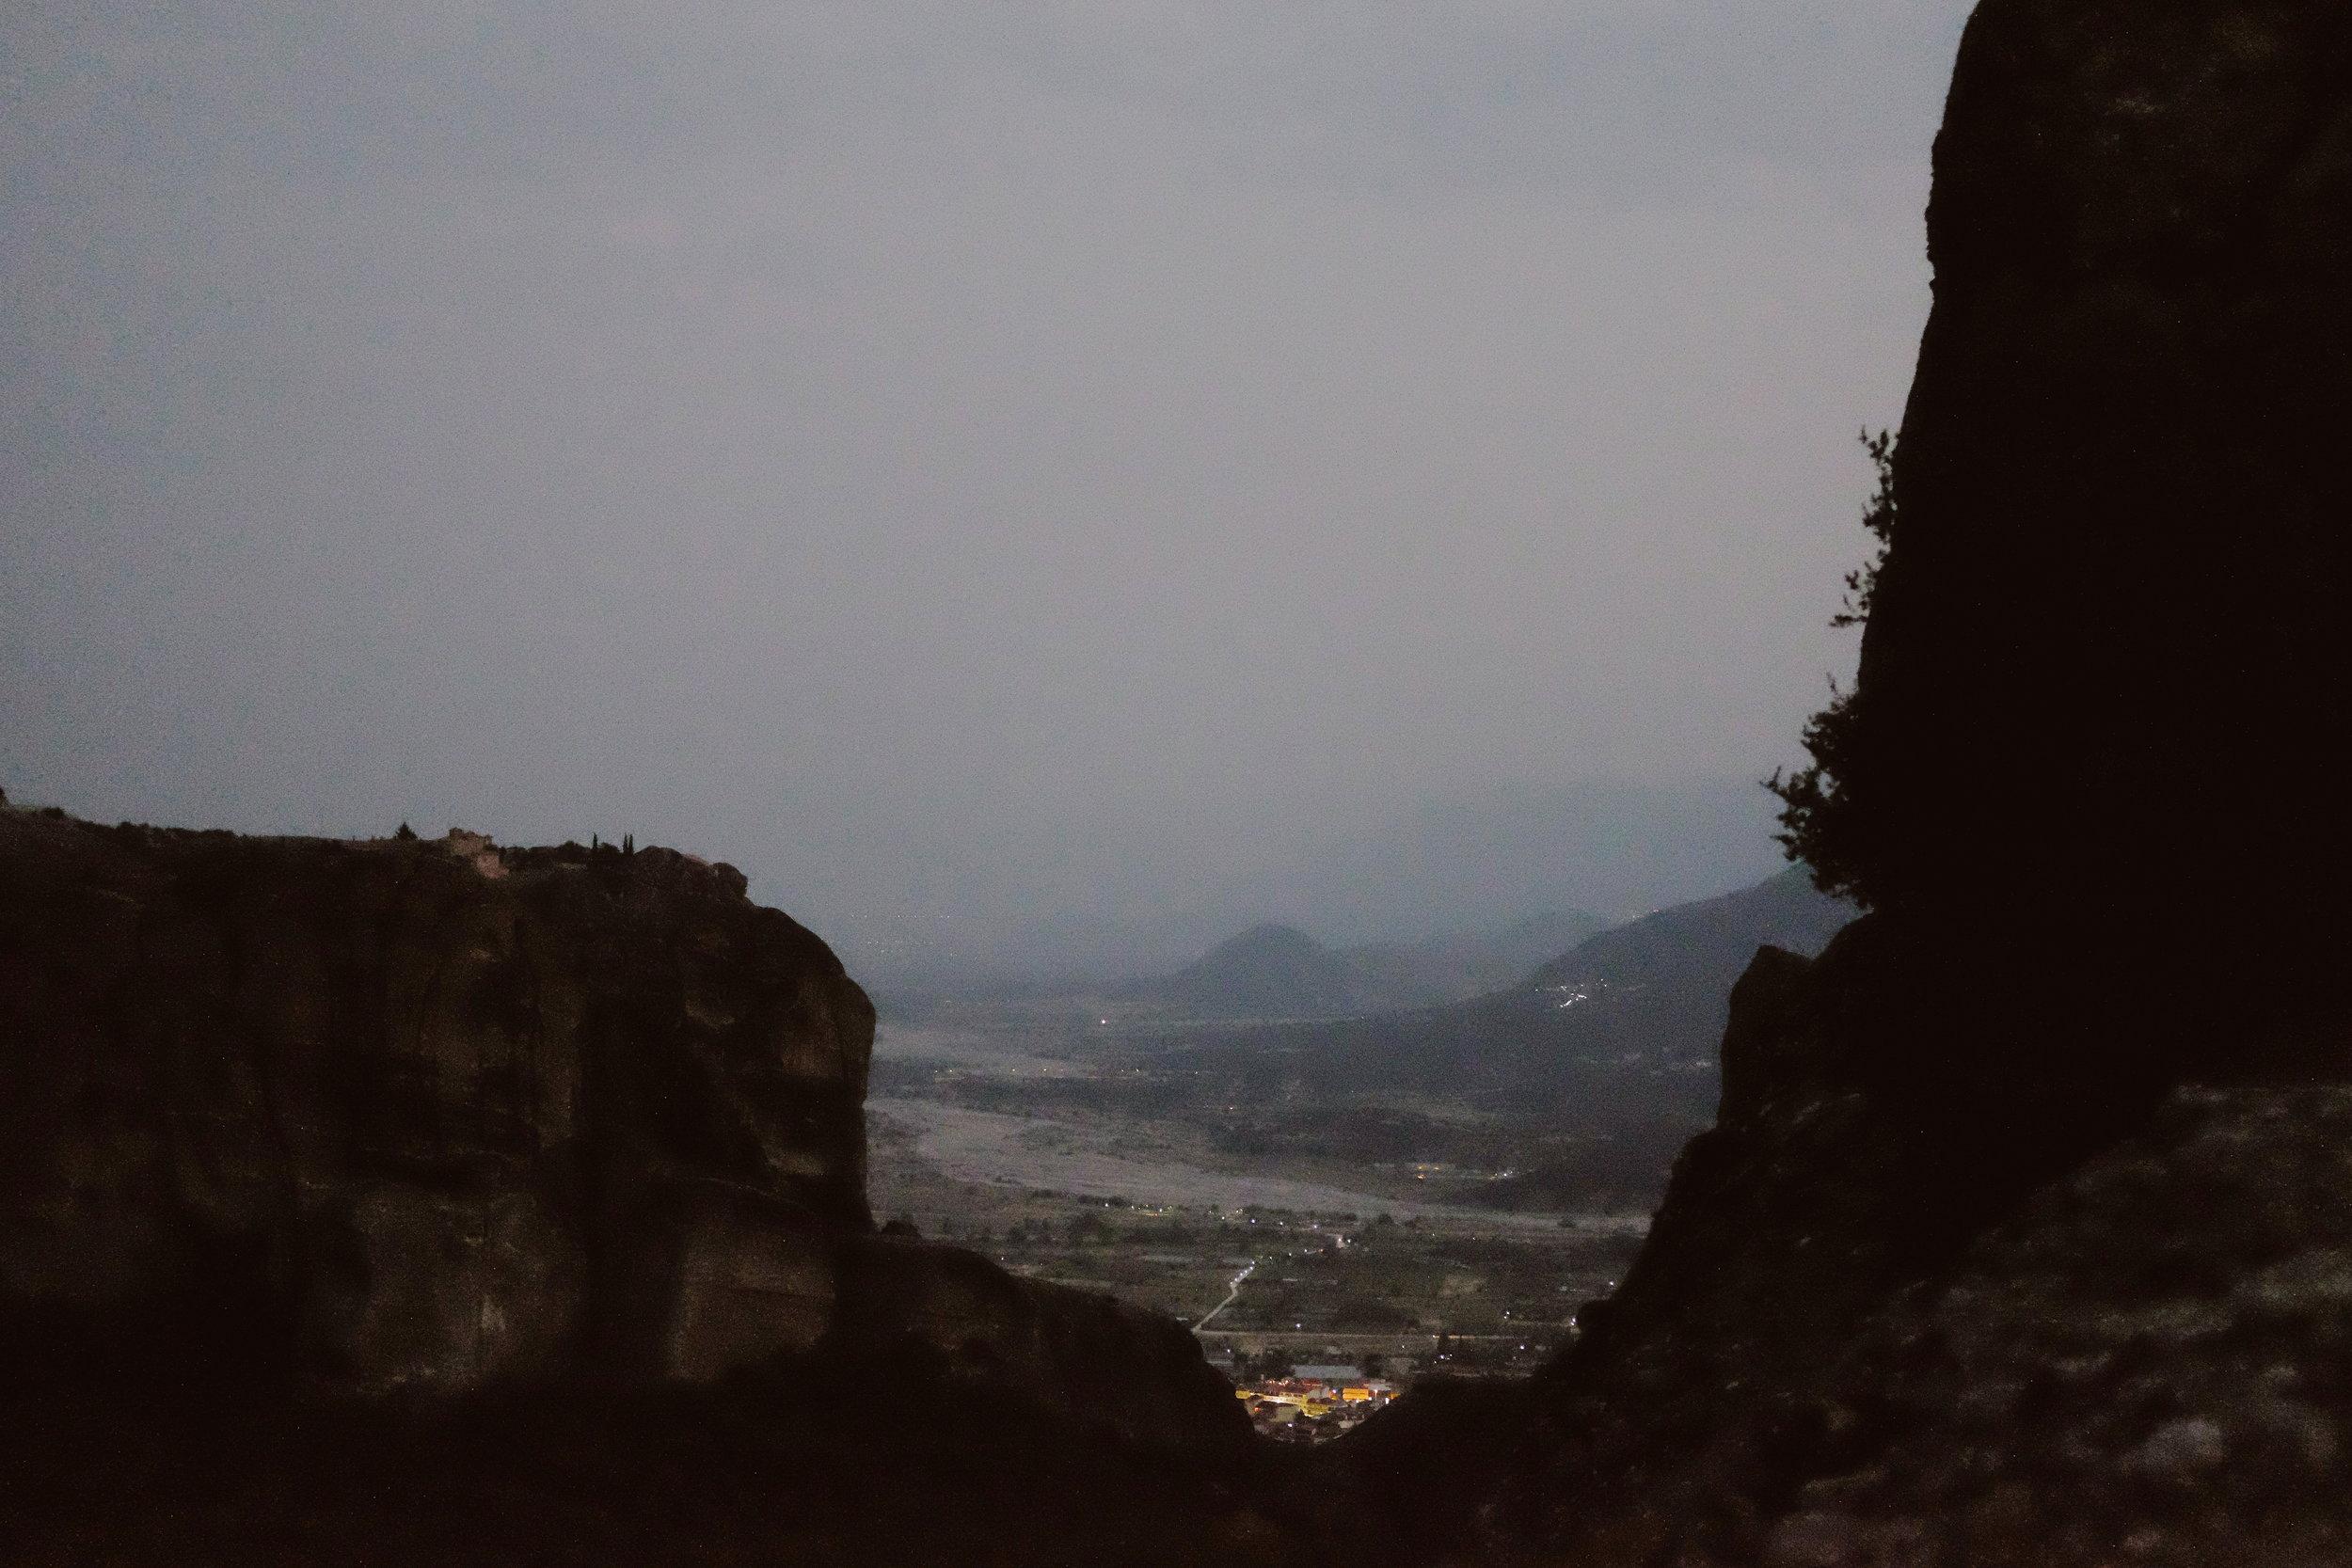 evening-rock-formations-town-lit-up-below-transcontinentalrace06